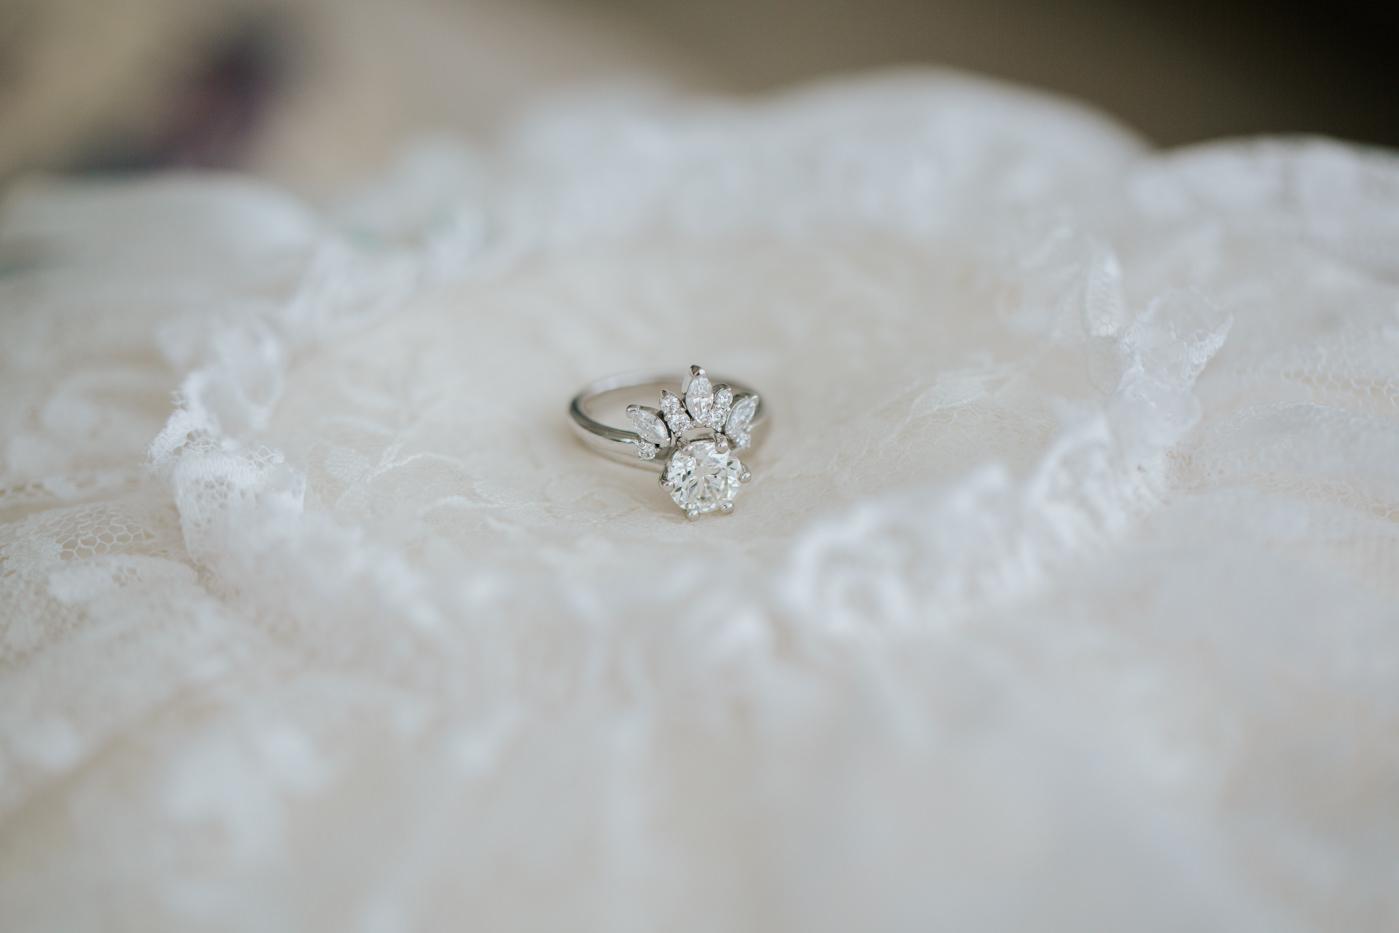 Nick & Vanezza - Fernbank Farm Wedding - Samantha Heather Photography-18.jpg